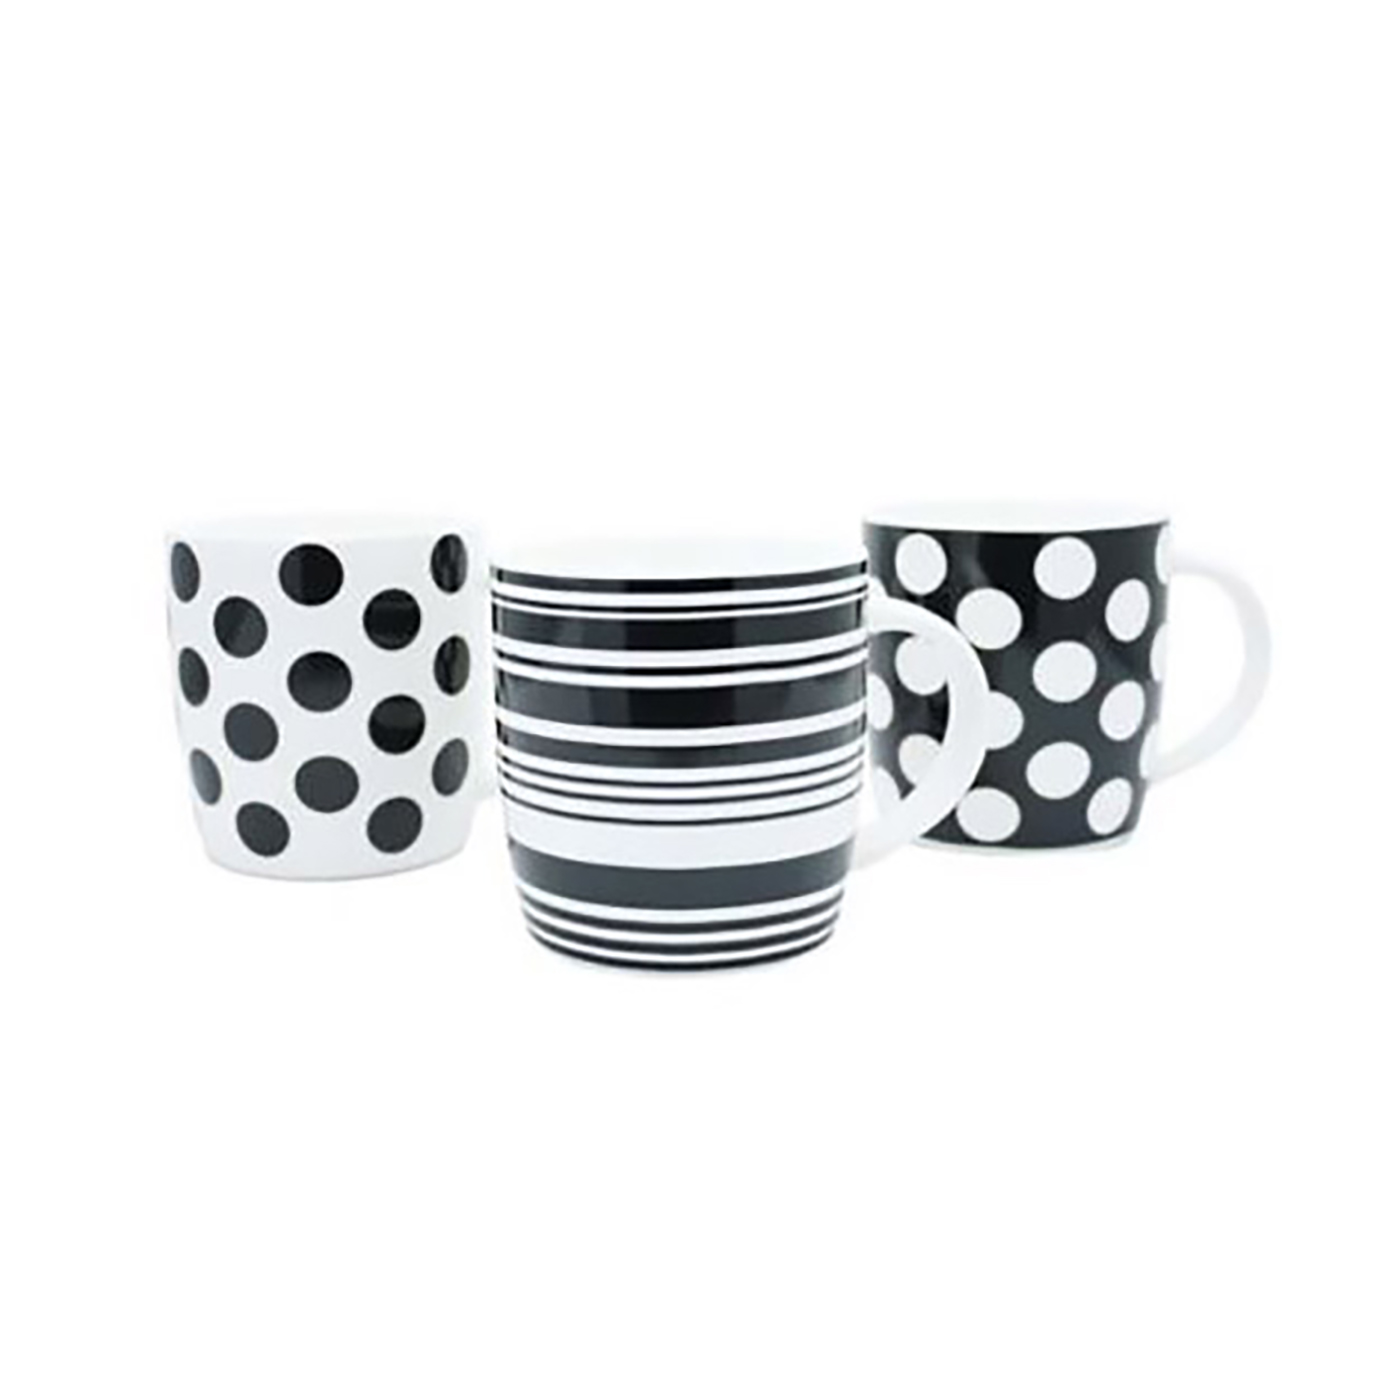 Squat Mugs Dot & Stripes 11oz Black & White Ref 0399352 [Pack 12]